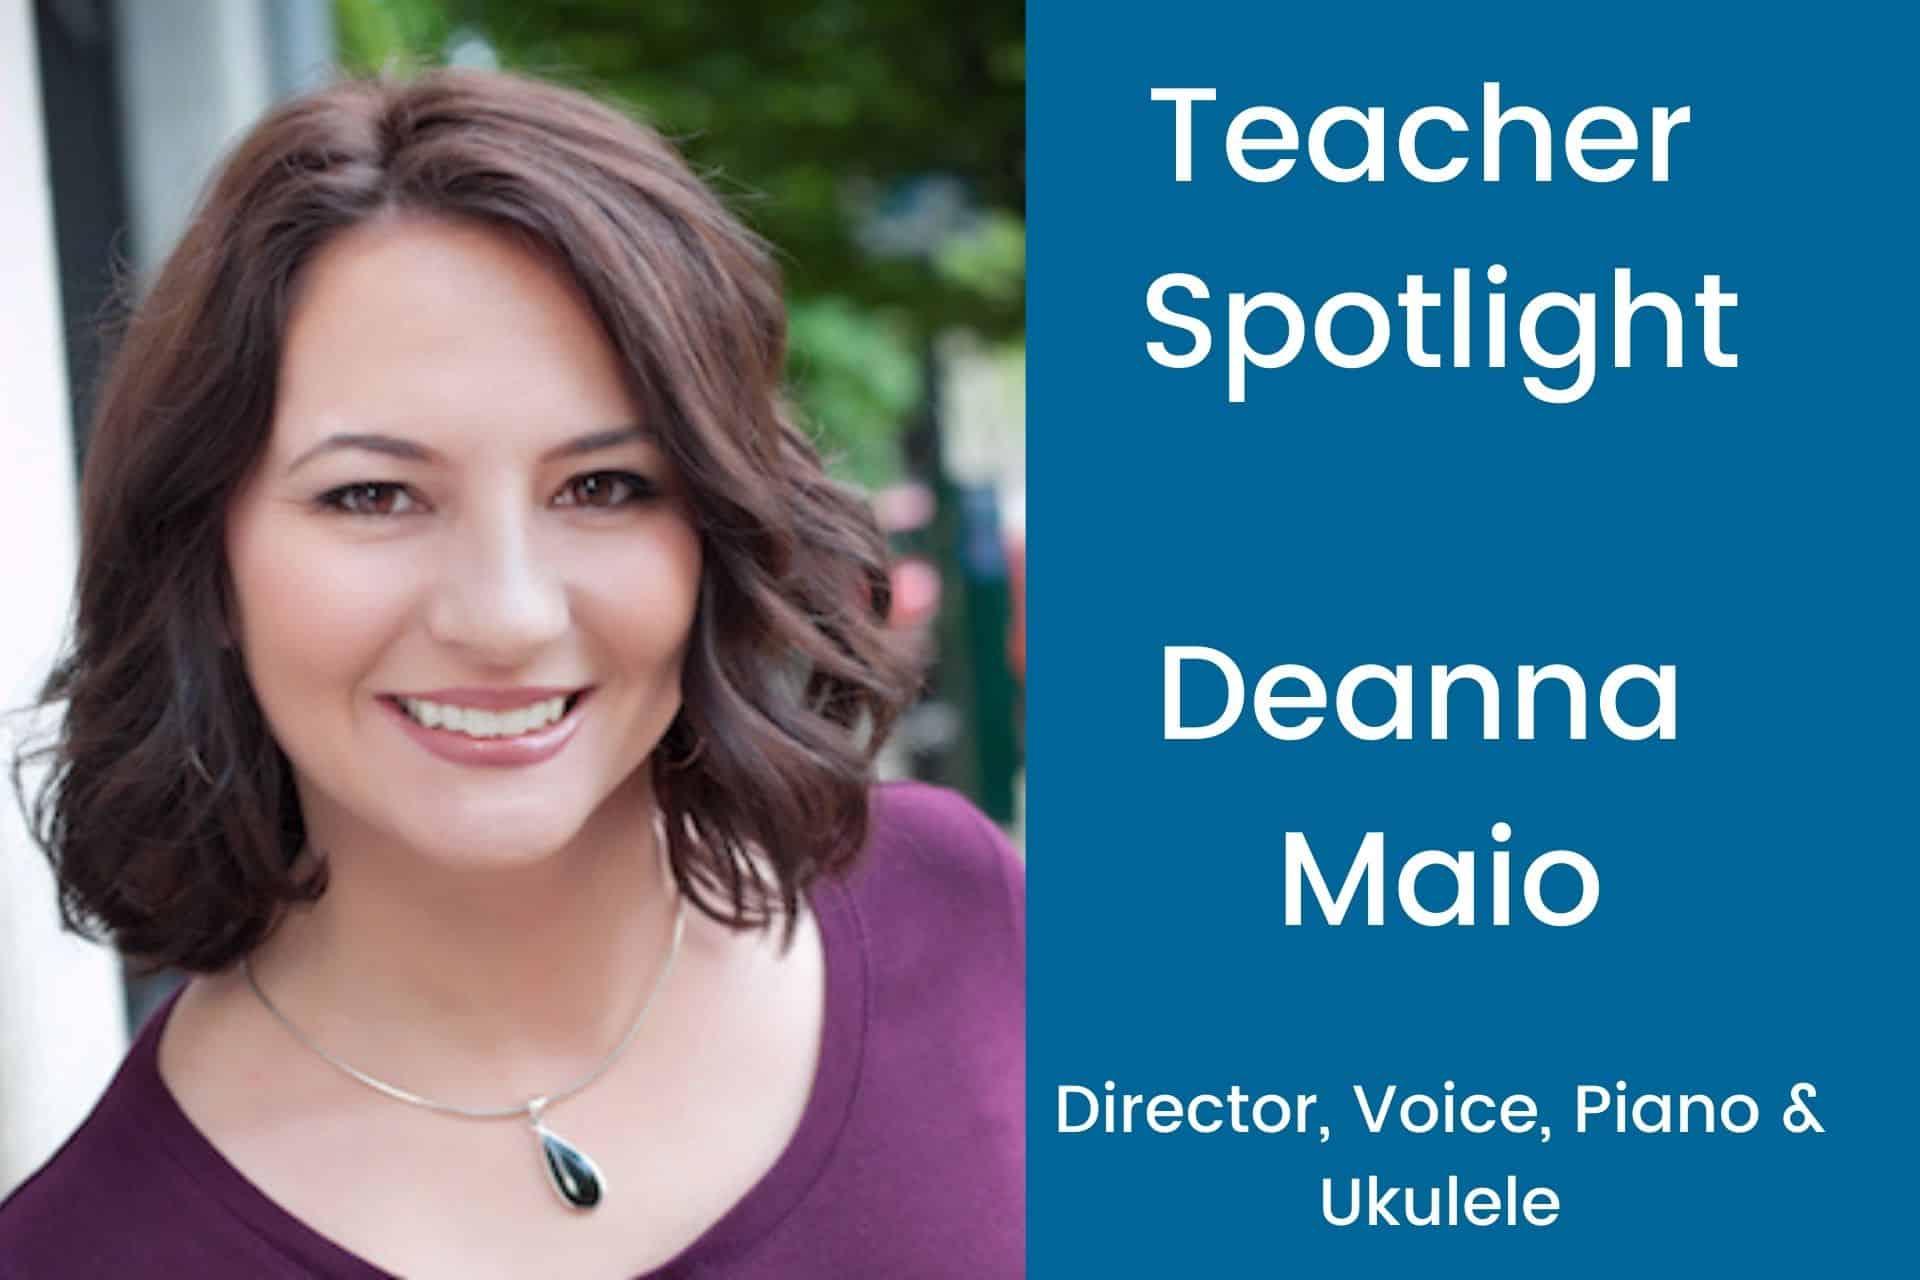 Teacher Spotlight Deanna